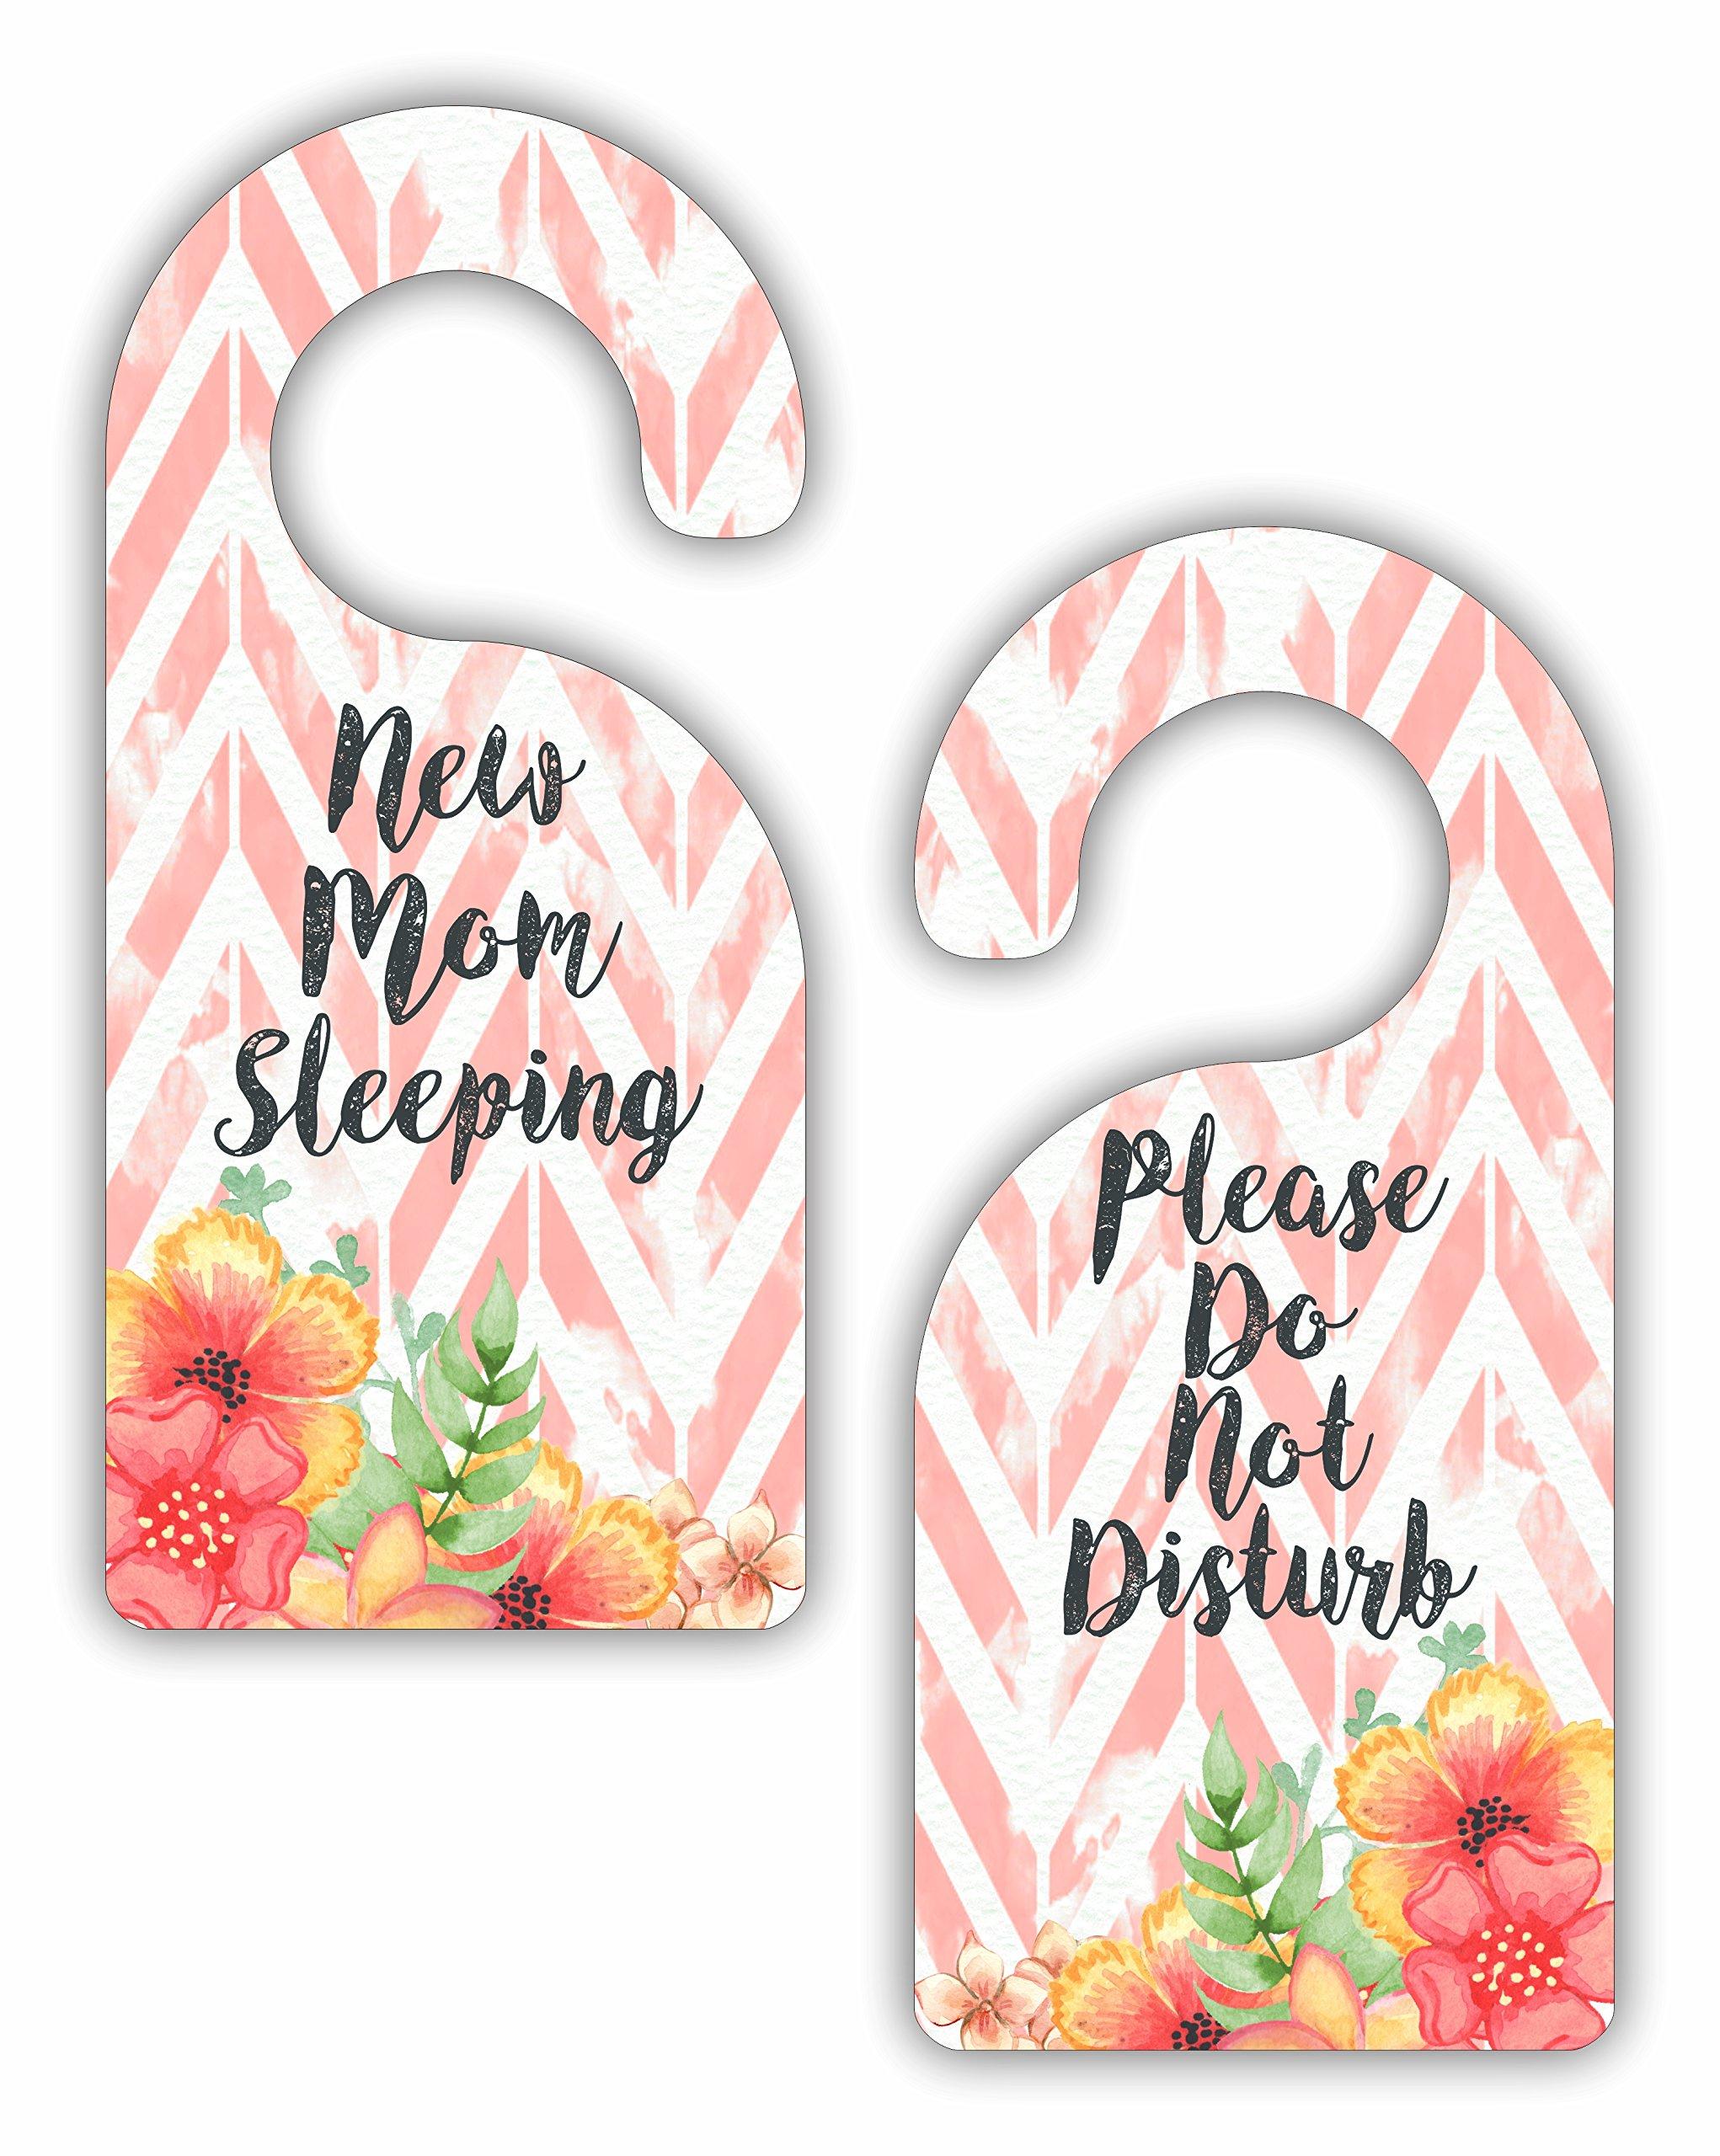 New Mom Sleeping - Please Do Not Disturb - Bedroom Door Sign Hanger - Double Sided - Hard Plastic - Glossy Finish